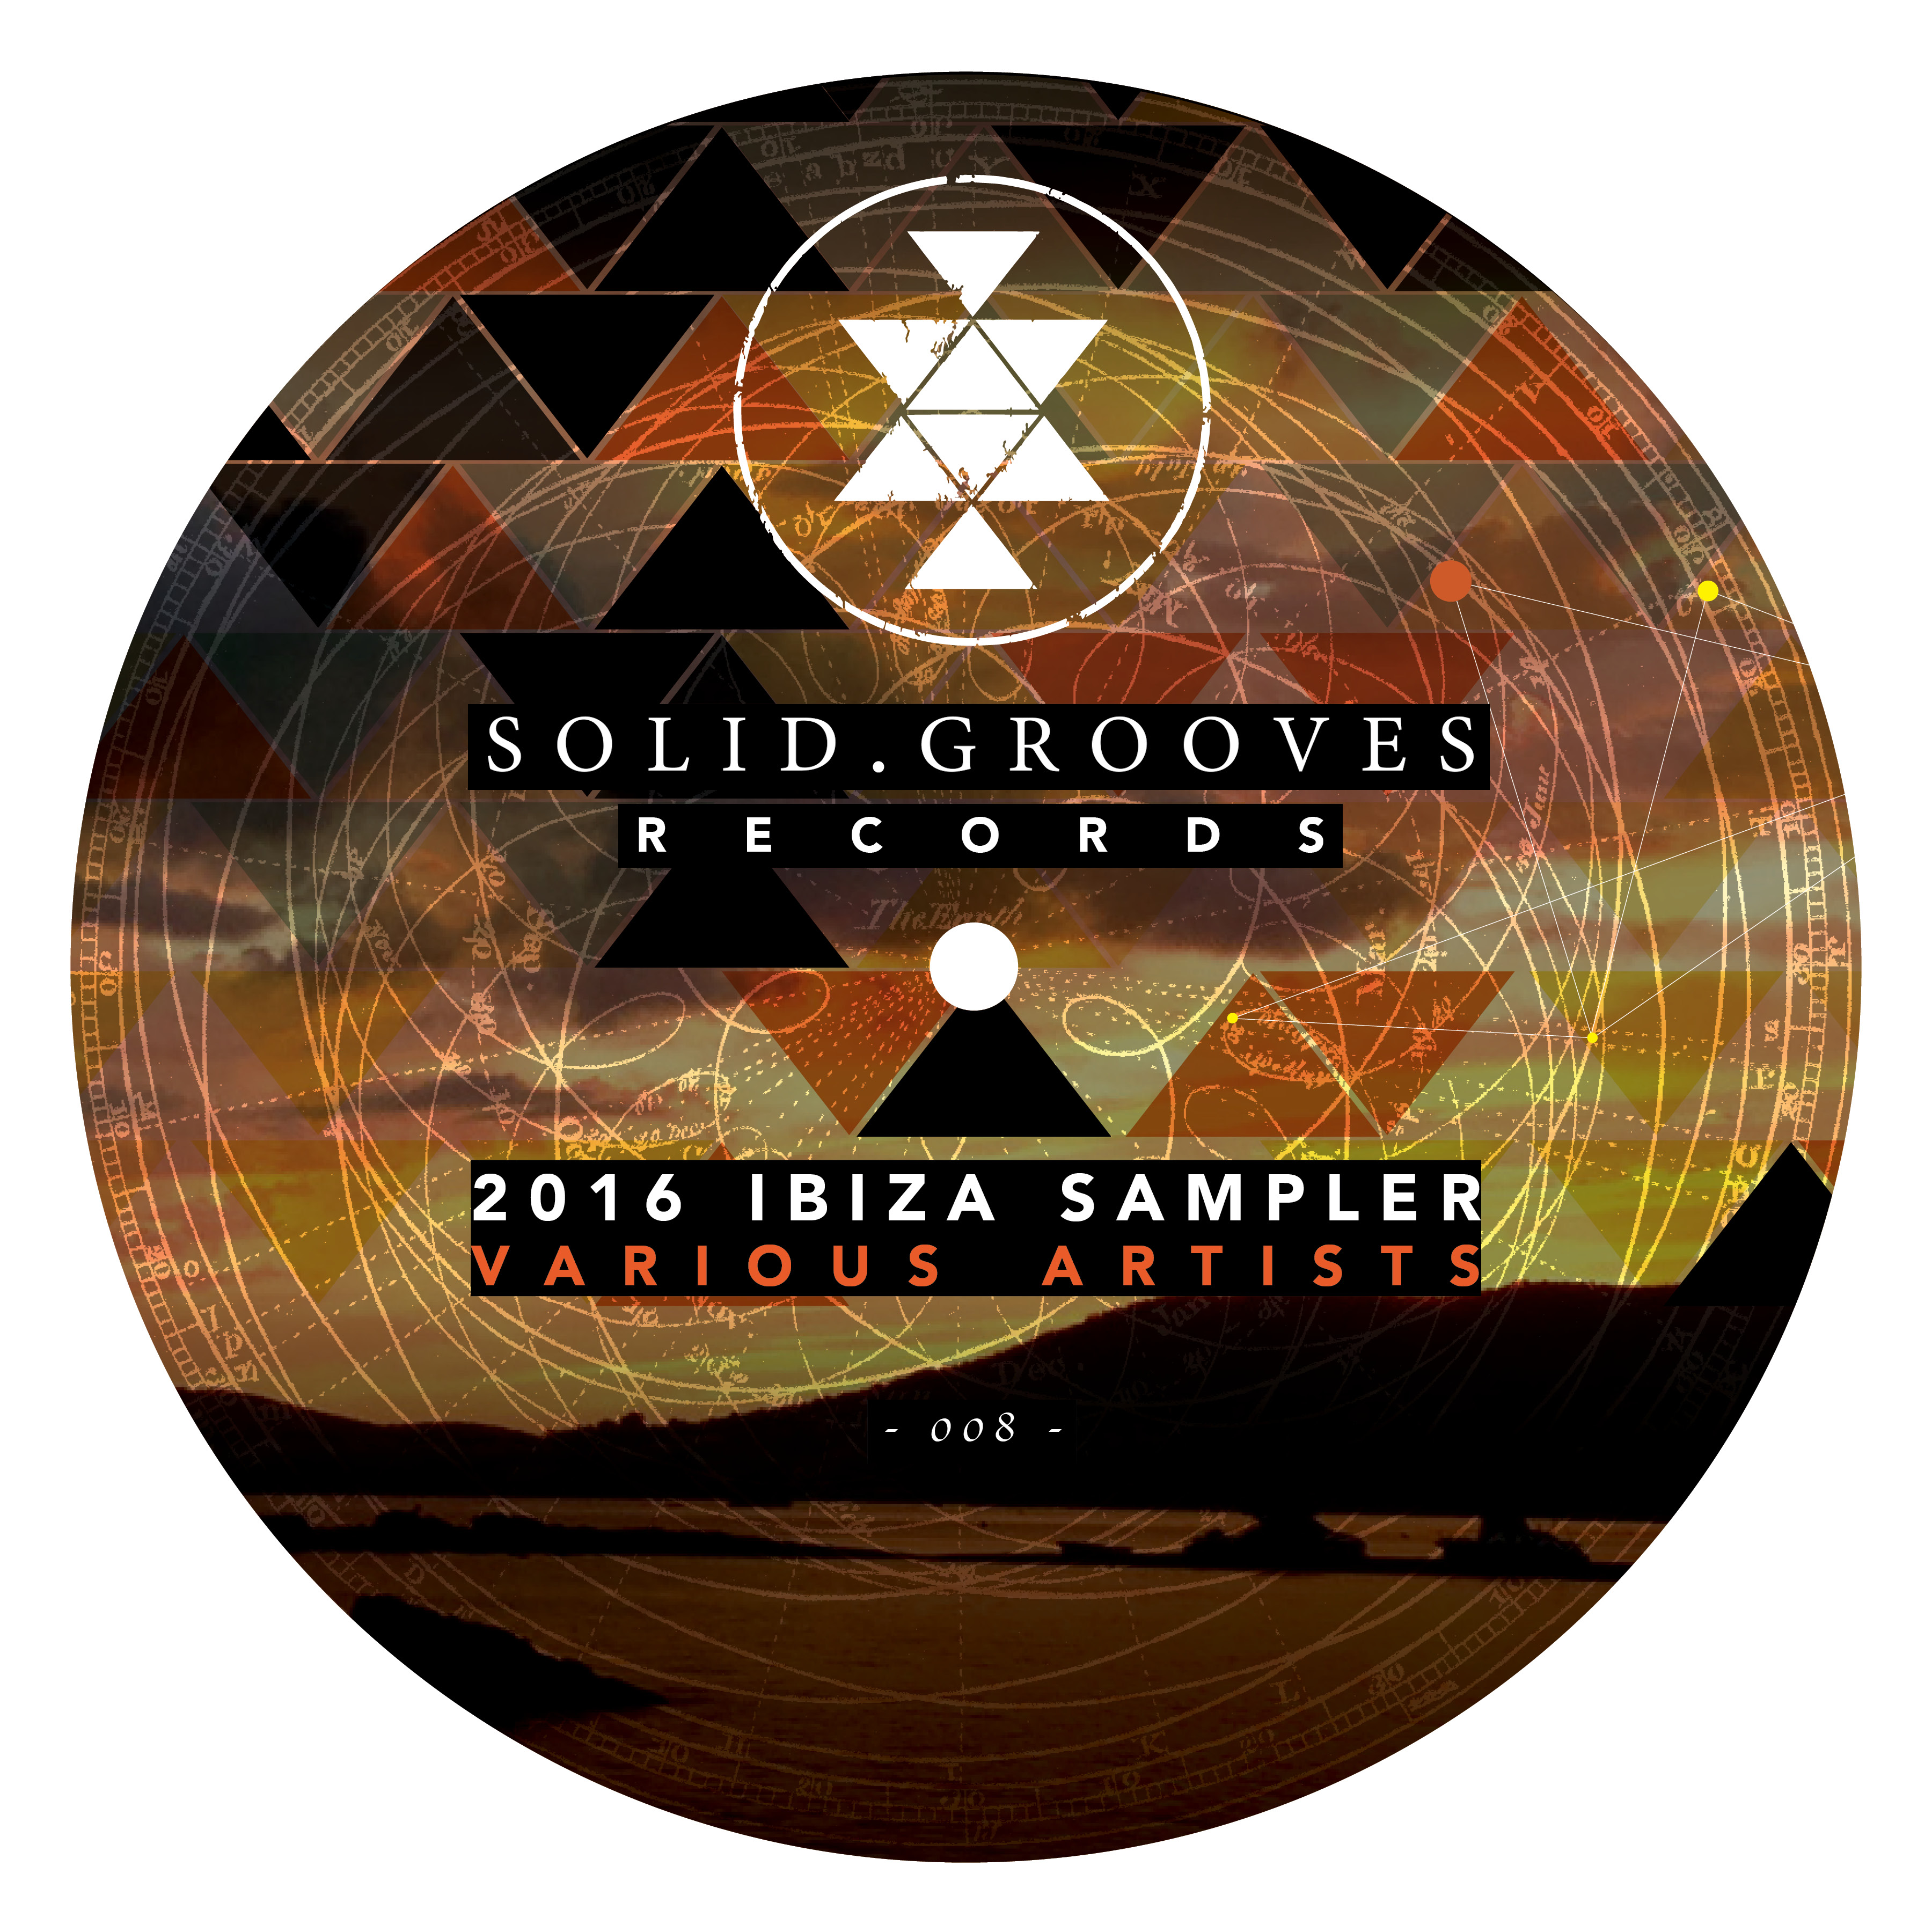 packshot_various_artists_-_2016_ibiza_sampler_-_solid_grooves_records.jpg